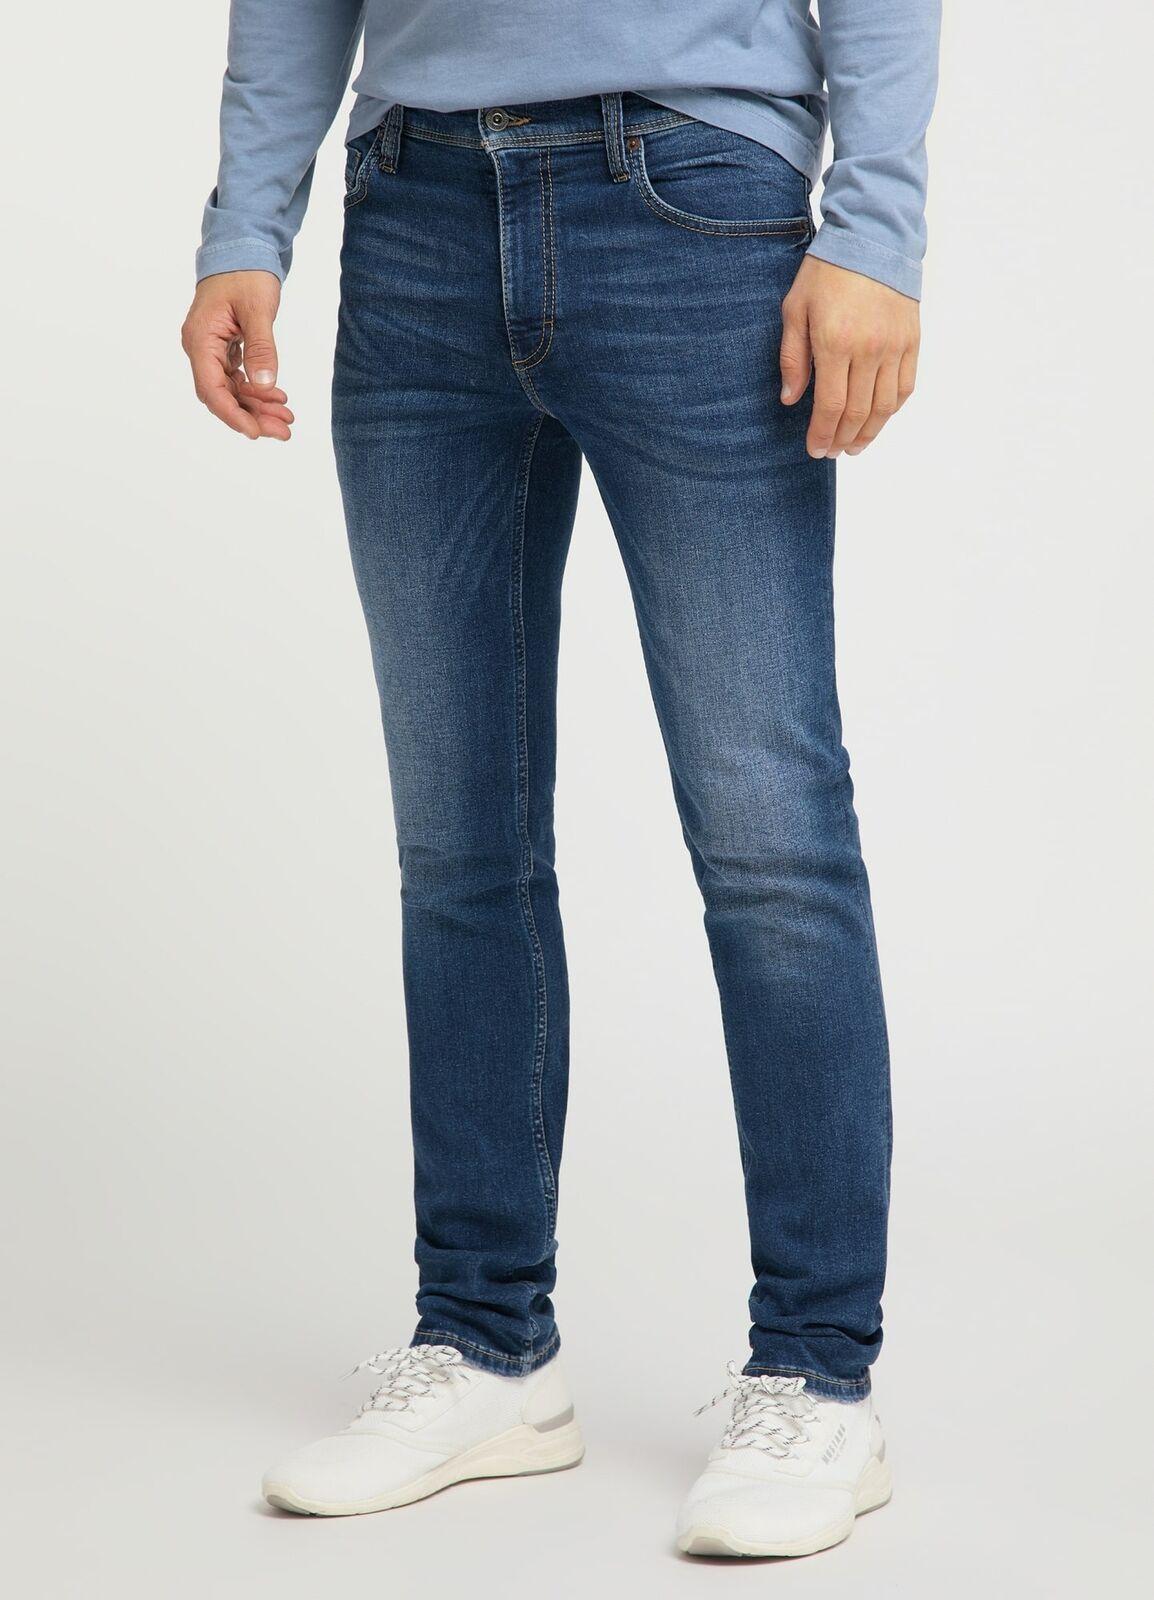 Mustang Washington Herren Slim Fit Jeans / Medium Rise / Blau